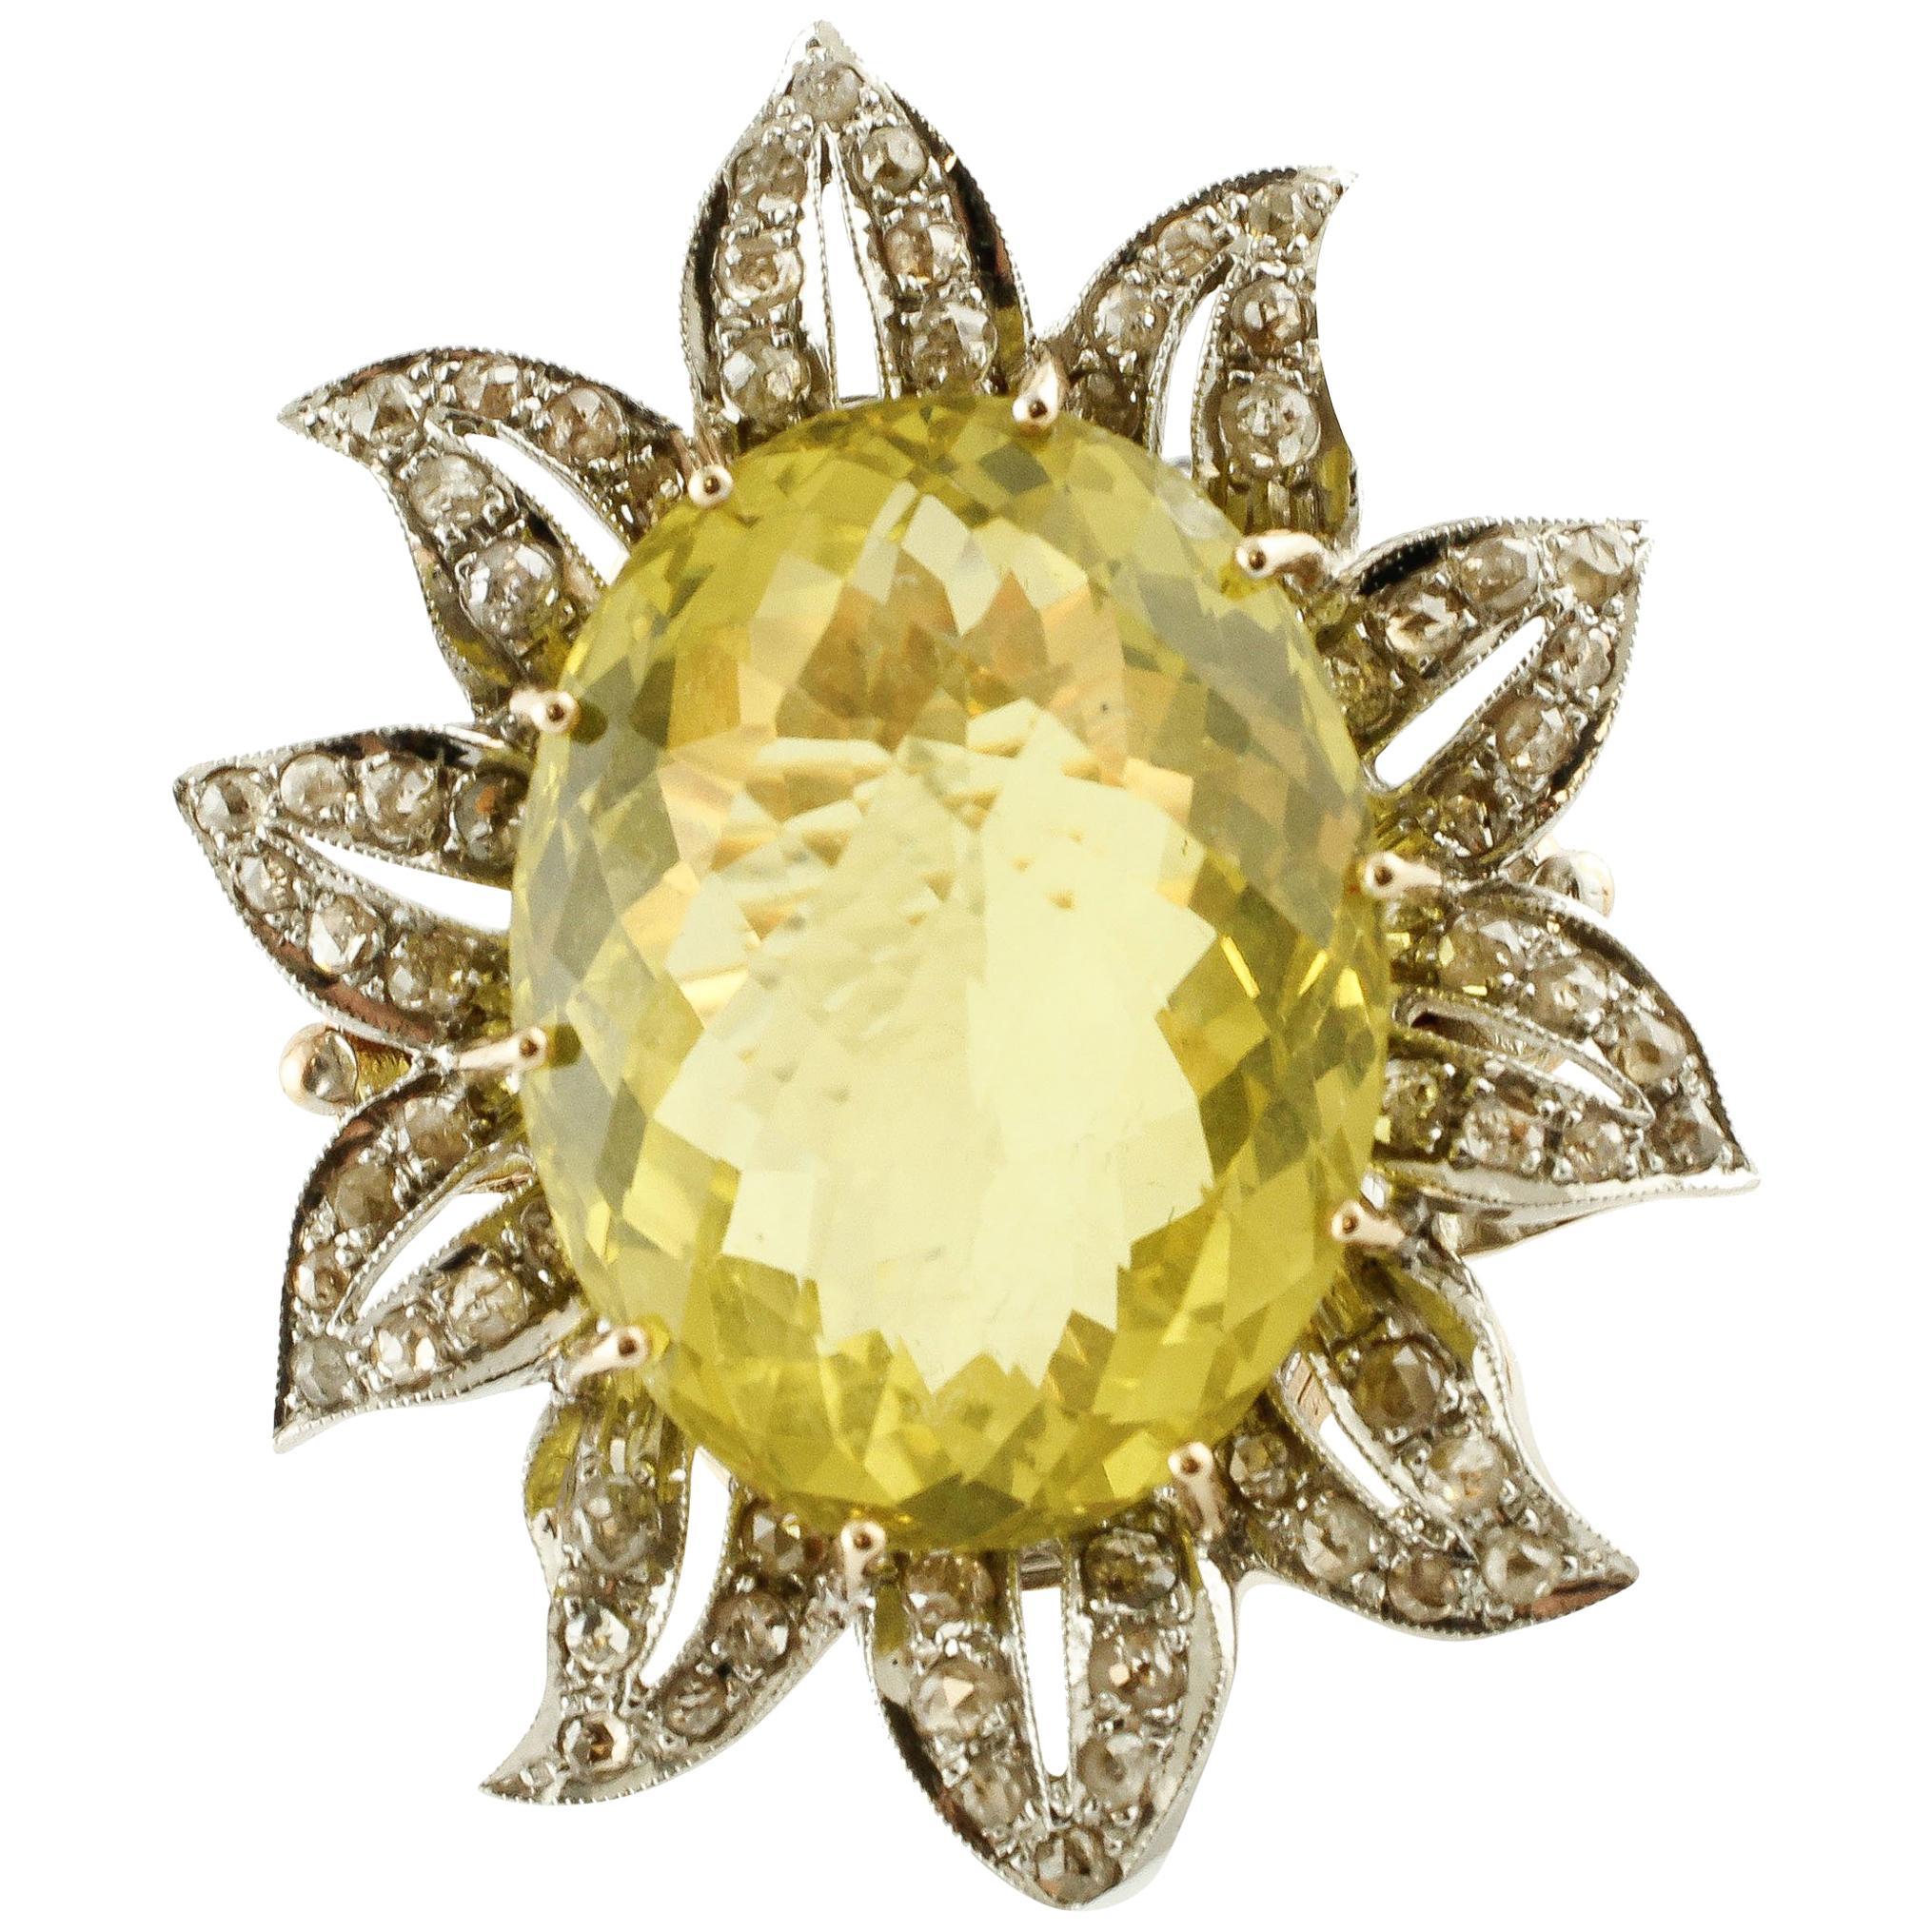 37.58 ct Lemon Citrine, 2.23 ct Diamonds,Rose Gold Silver Flower Fashion Ring